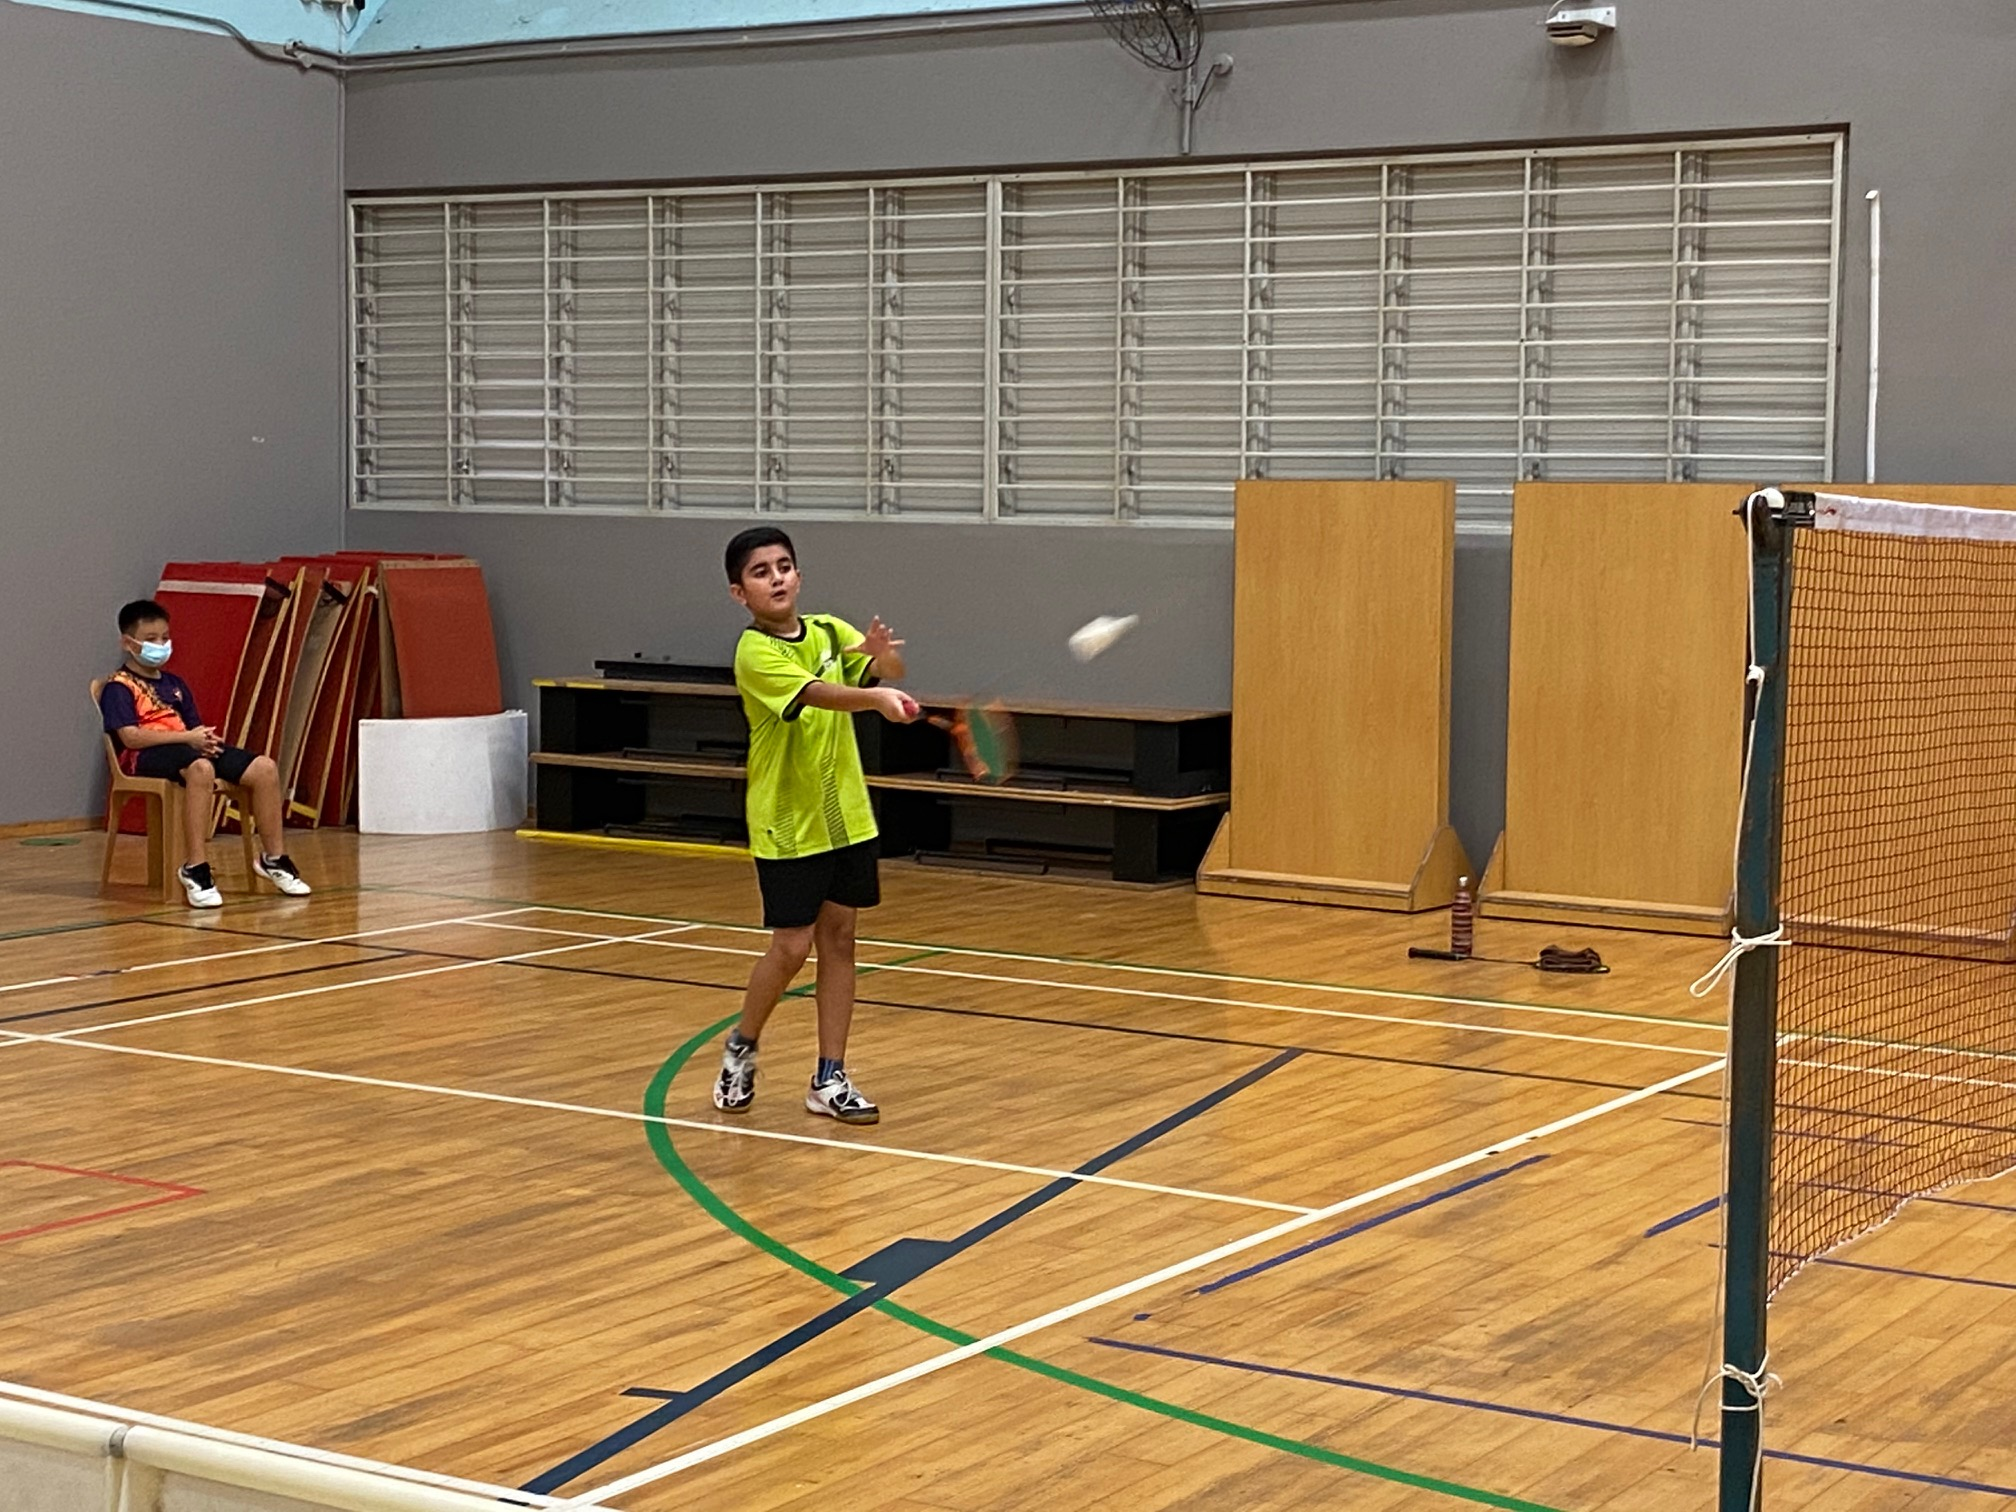 NSG Snr Div South Zone boys' badminton_ SJI Junior first singles player